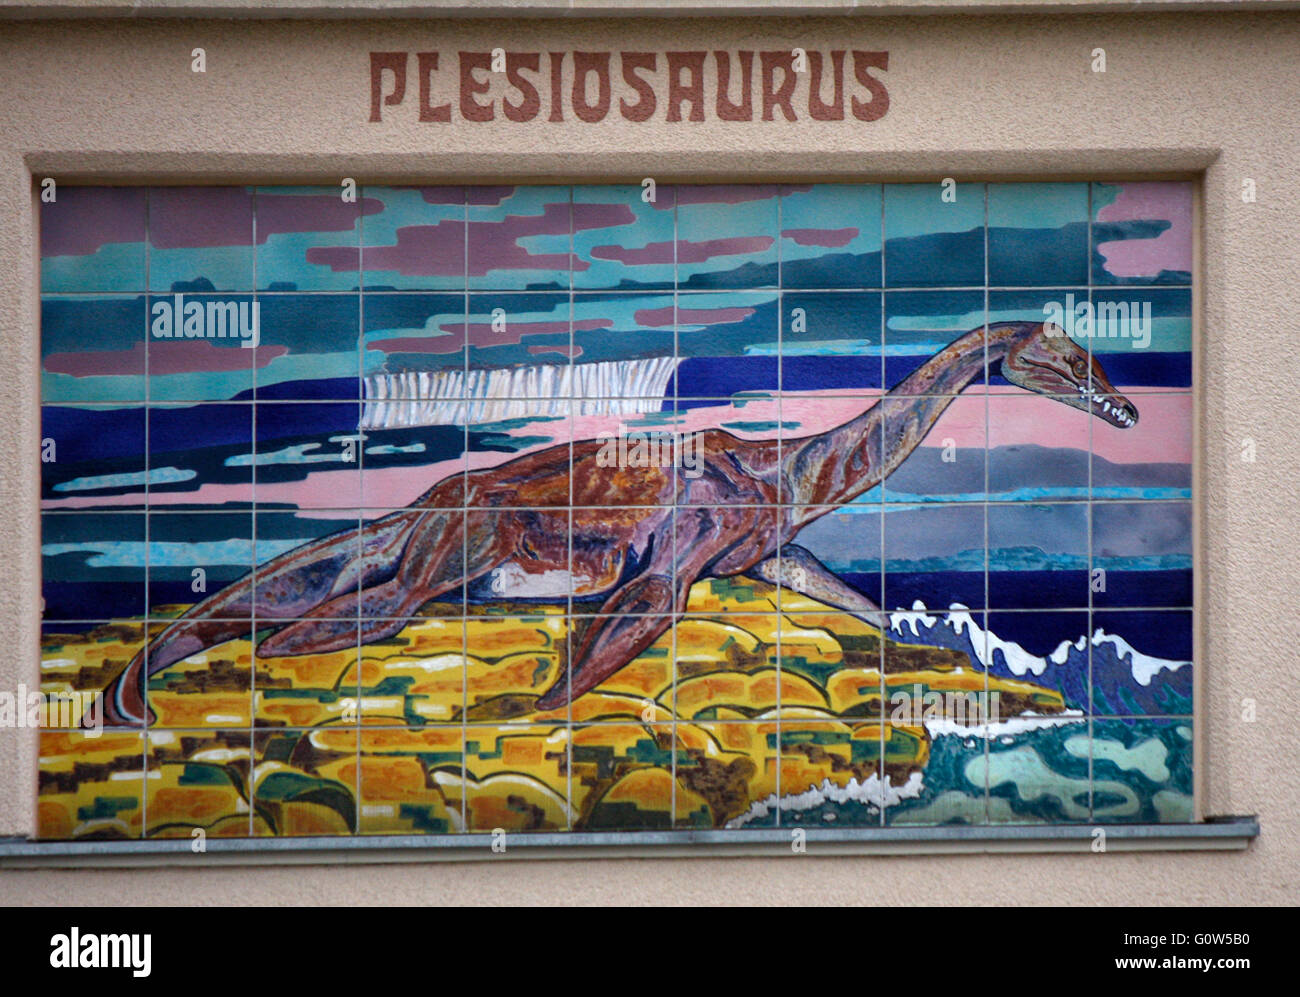 Darstellung eines Plesiosaurus, Berliner Zoo, Berlin. - Stock Image